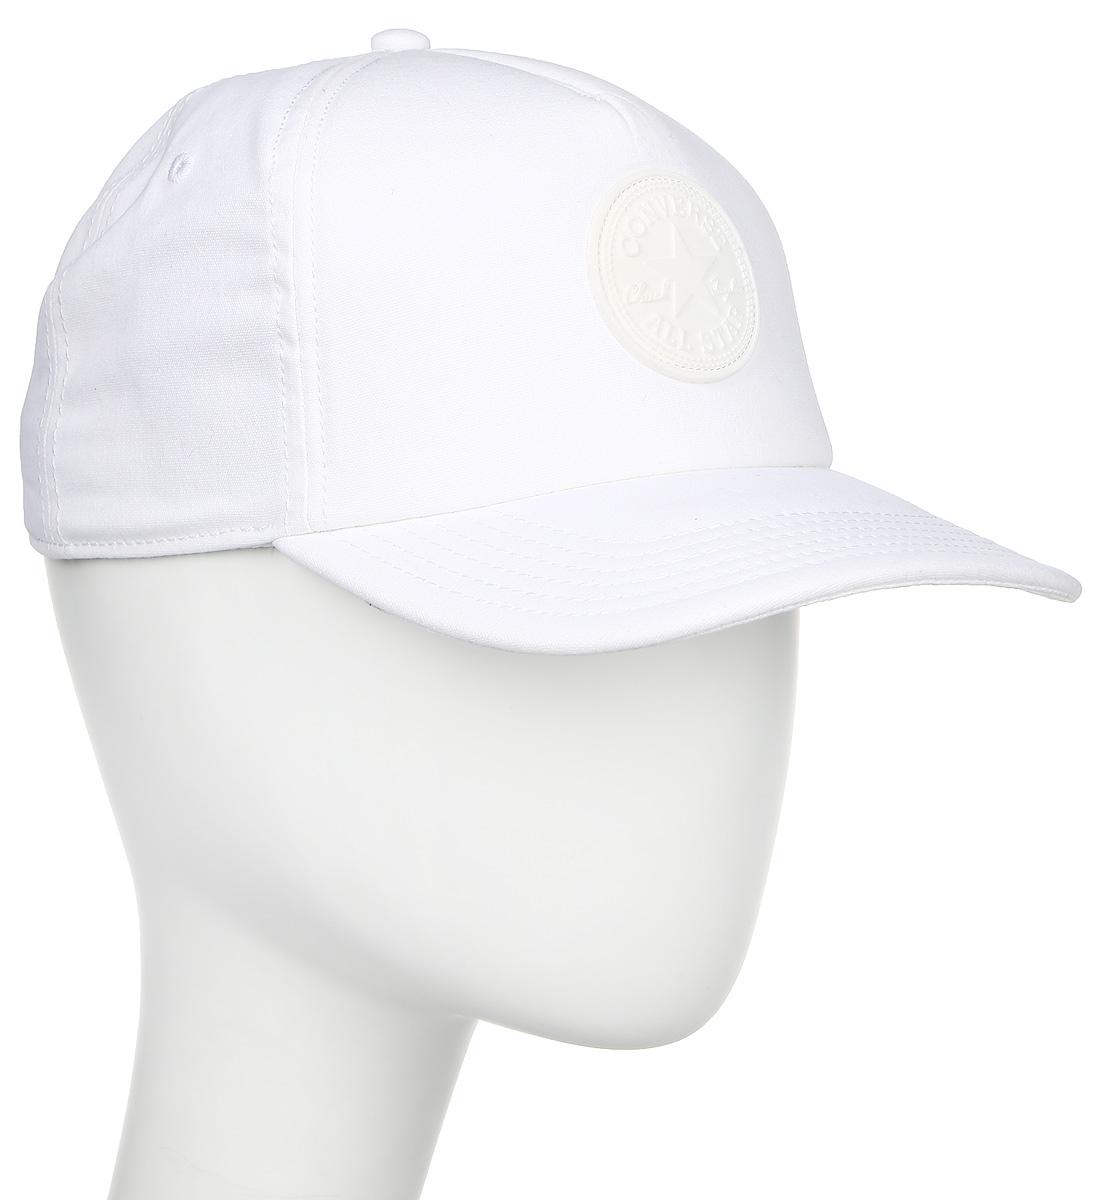 Бейсболка Converse Rubber Patch Trucker, цвет: белый. 529851. Размер универсальный бейсболка the north face mudder trucker hat цвет хаки бежевый t0cgw2scg размер универсальный